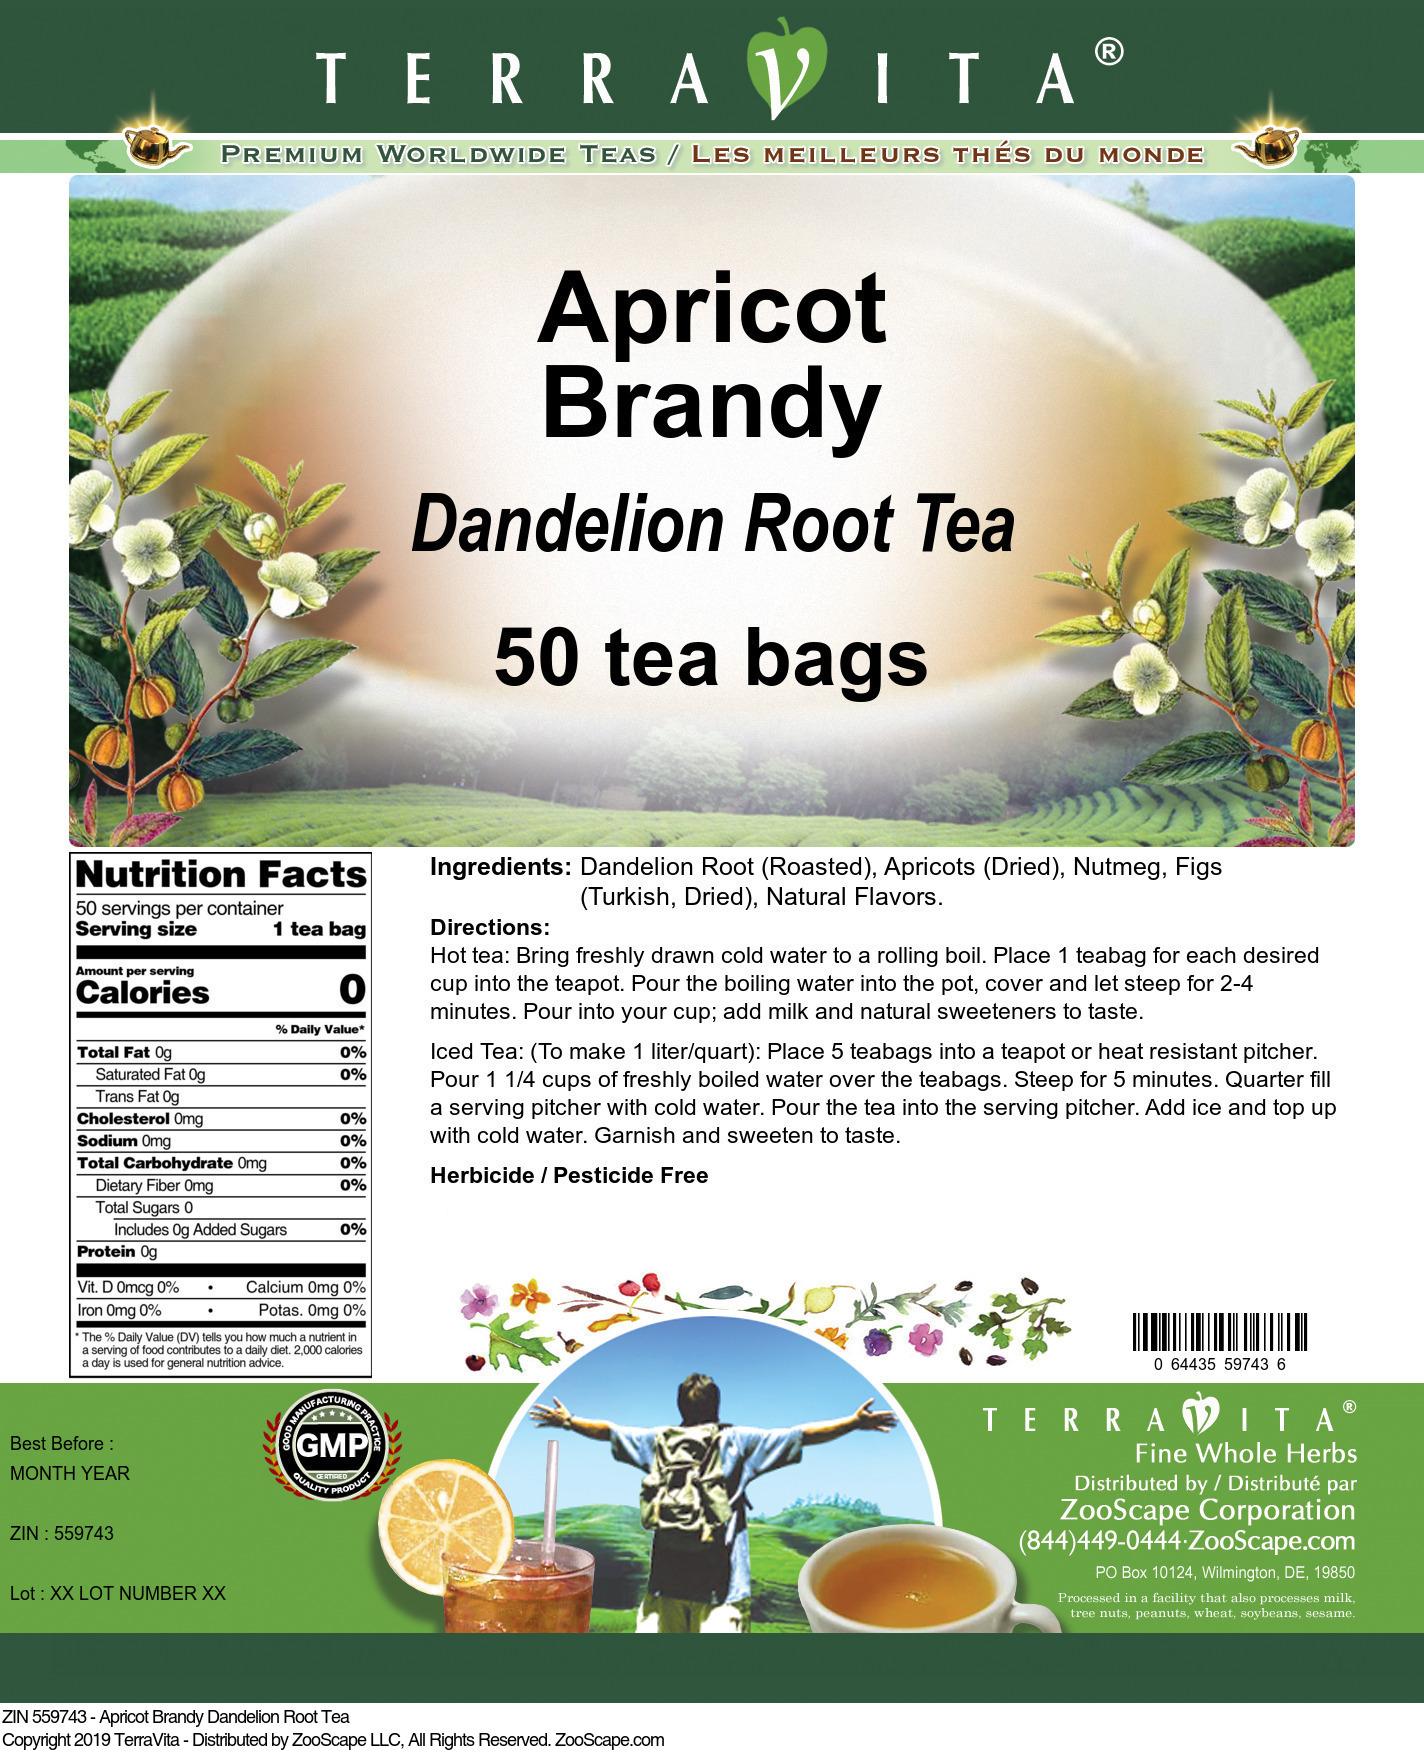 Apricot Brandy Dandelion Root